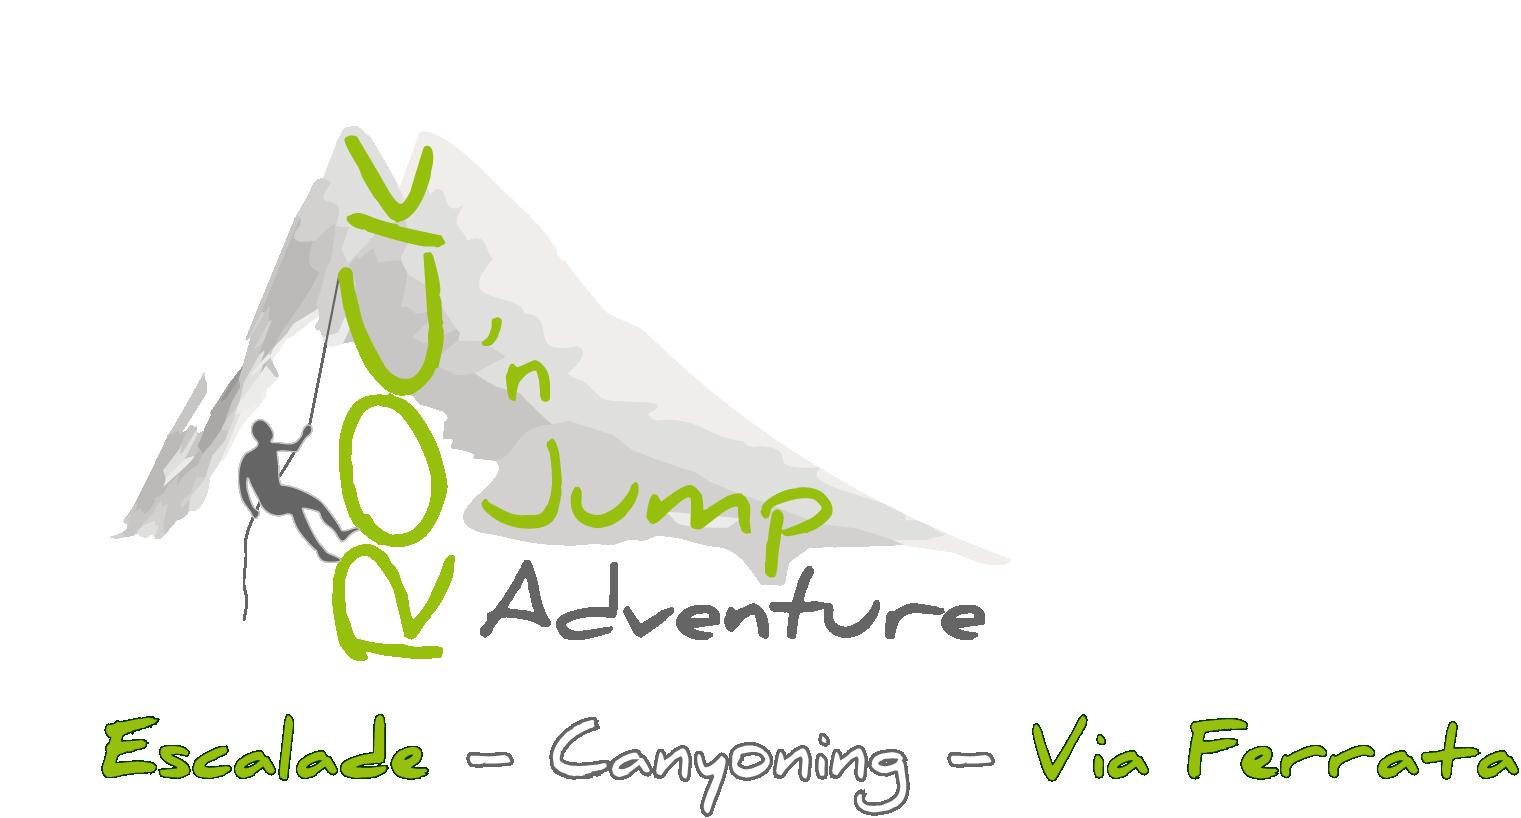 Canyoning Saint Claude Jura